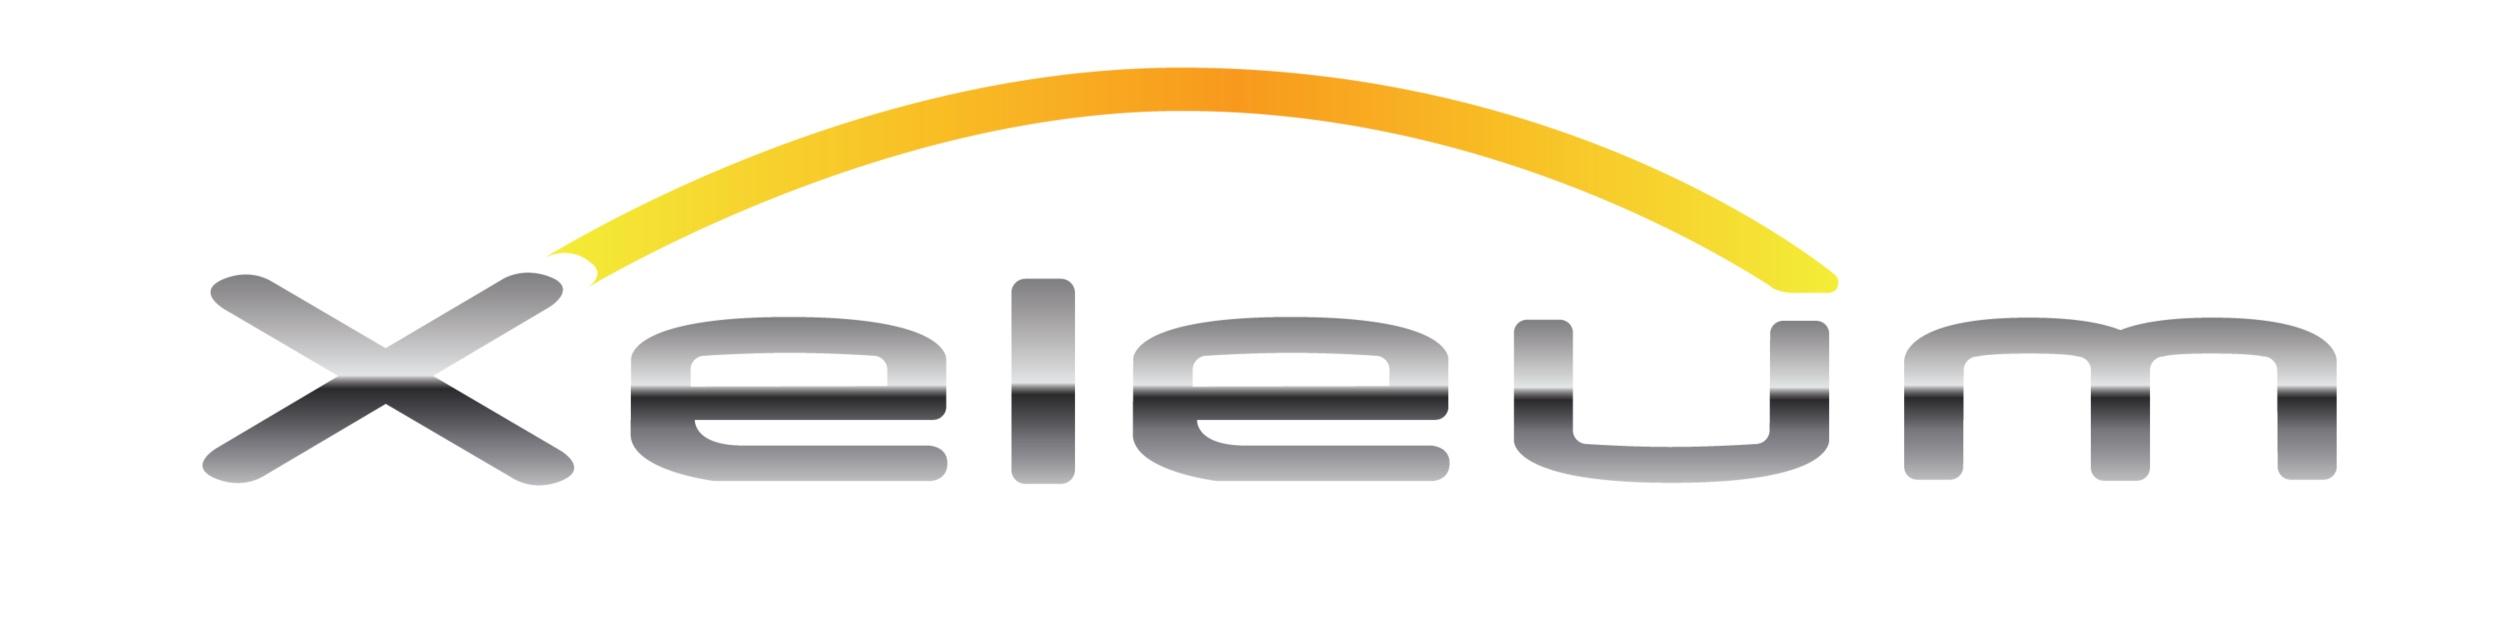 Xeleum+Logo.jpg